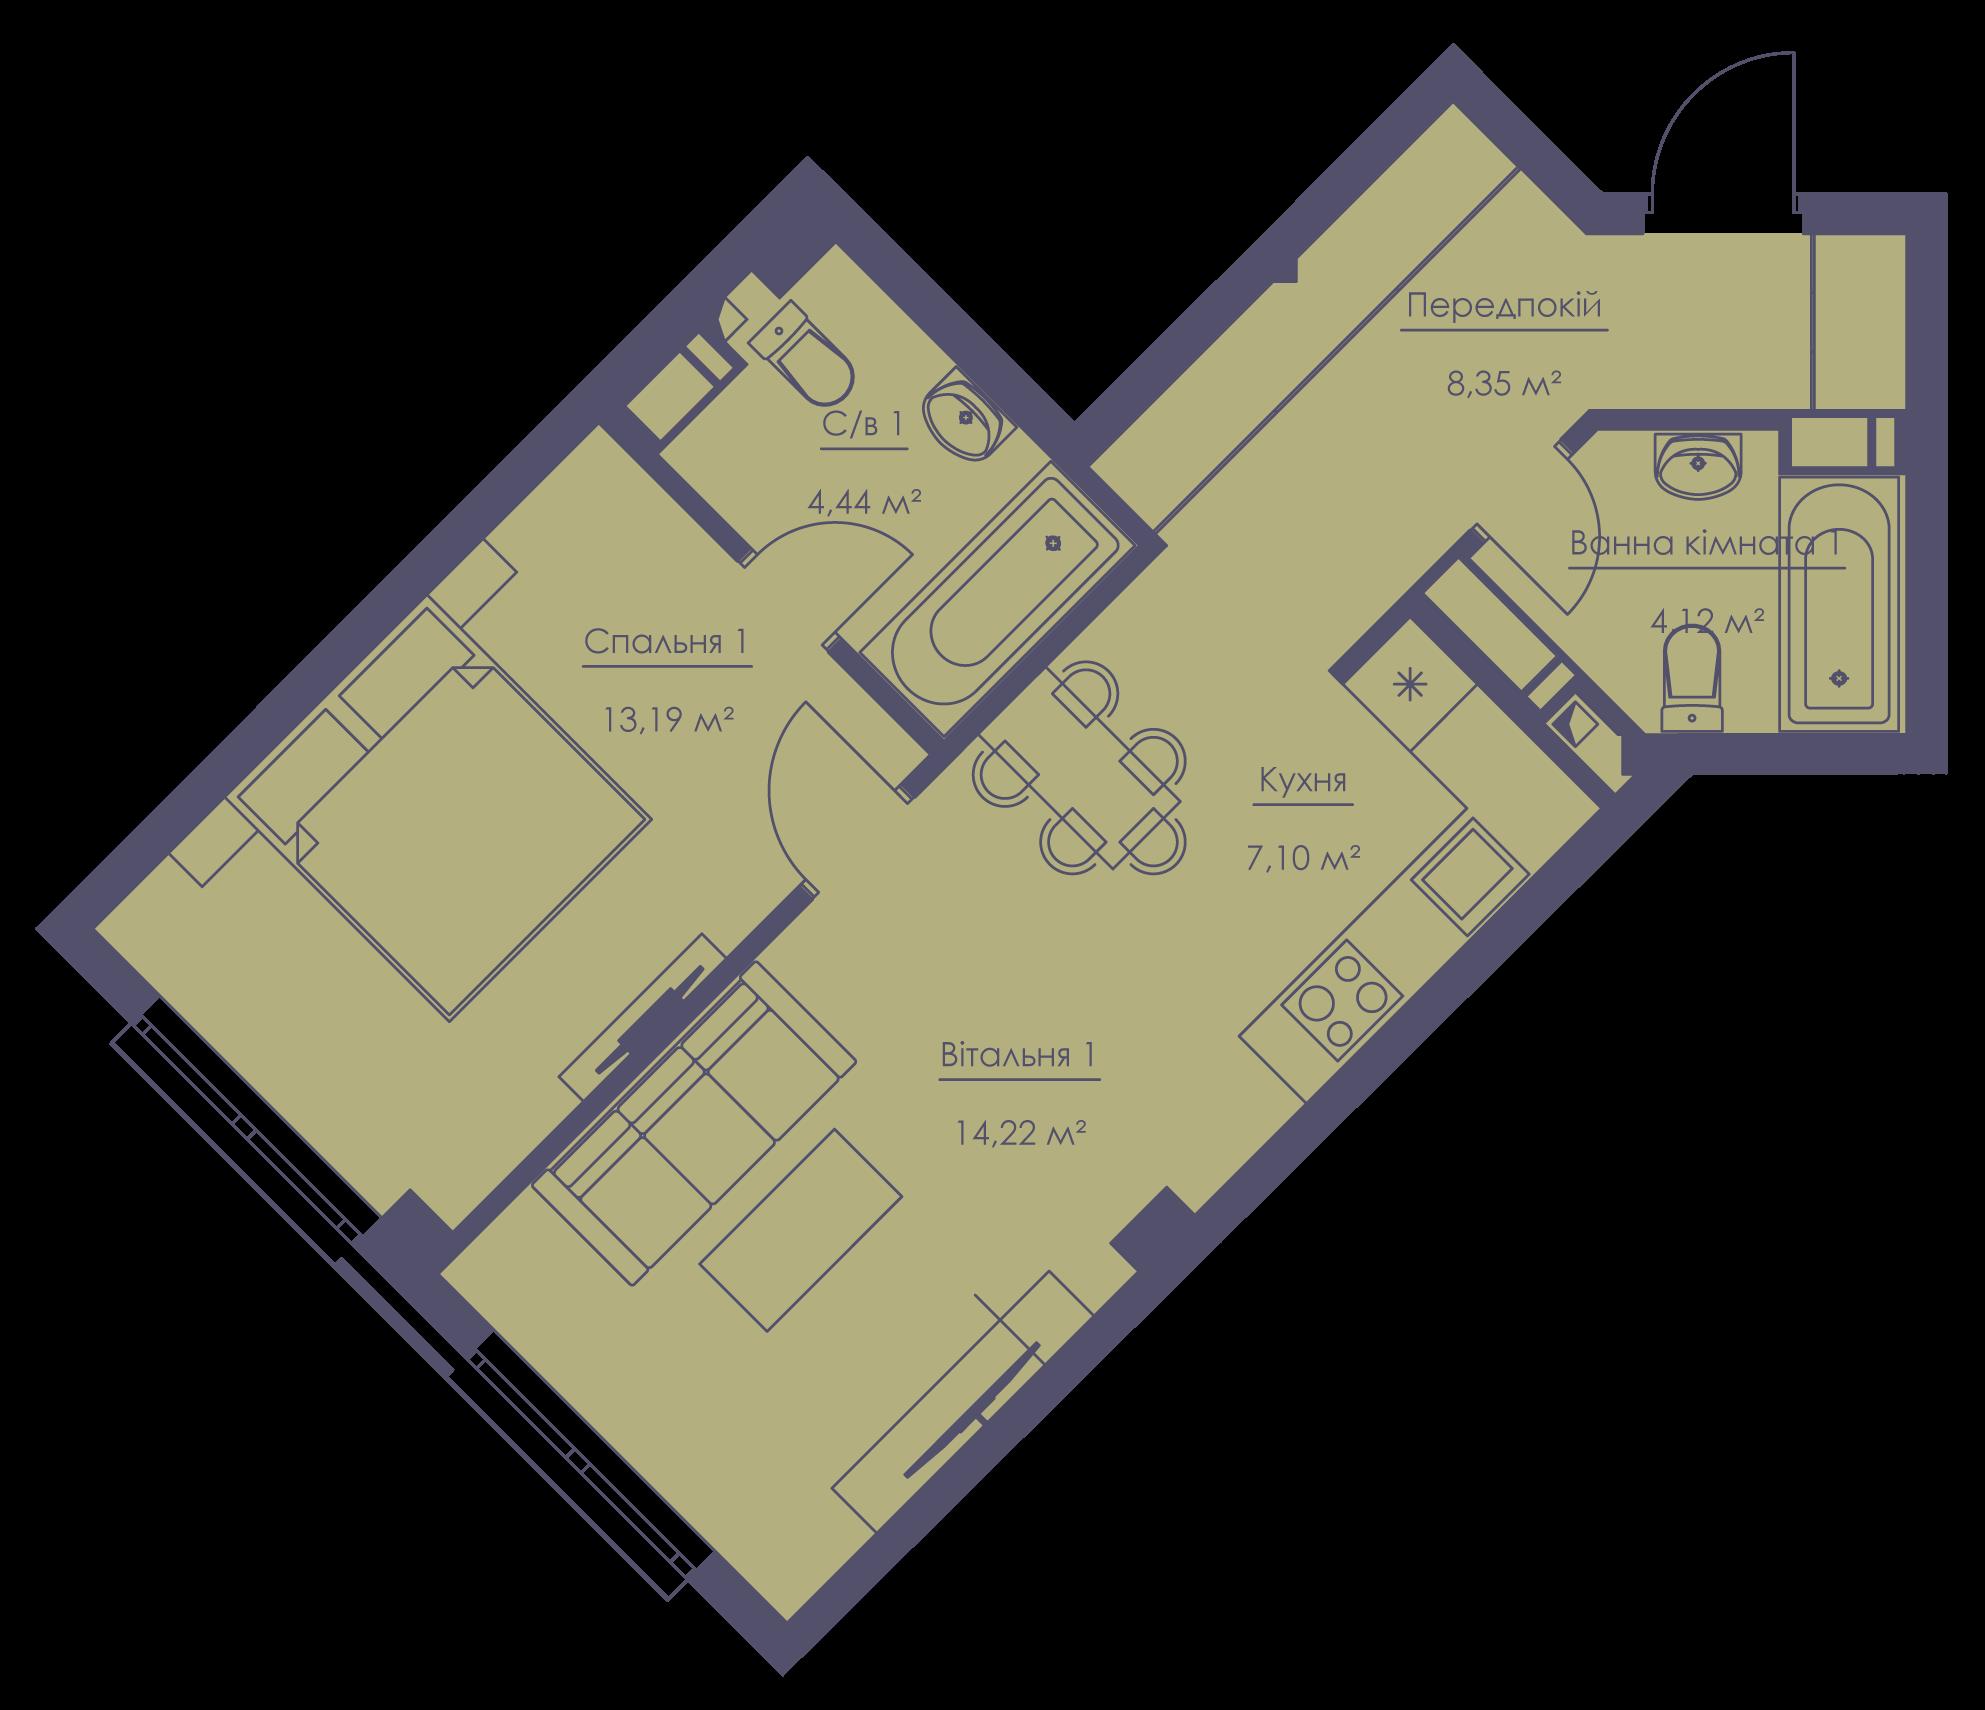 Apartment layout KV_45_2m_1_1_3-1